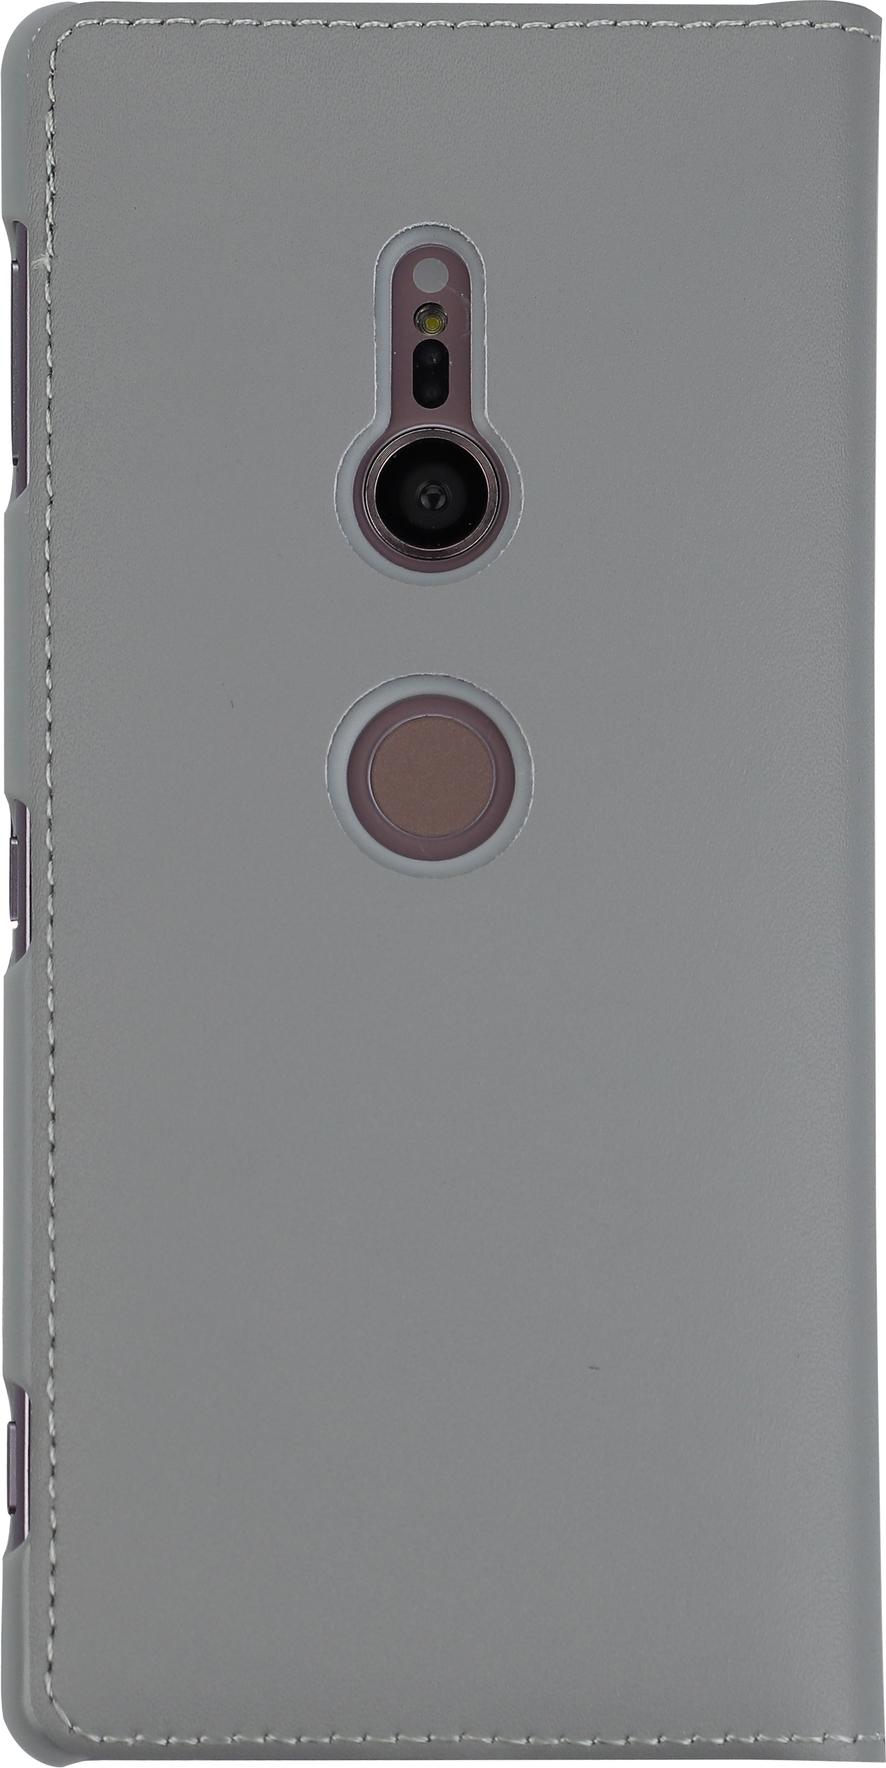 Чехол Brosco Book для Sony Xperia XZ2, серый  2025303001125, XZ2-BOOK-GREY 3